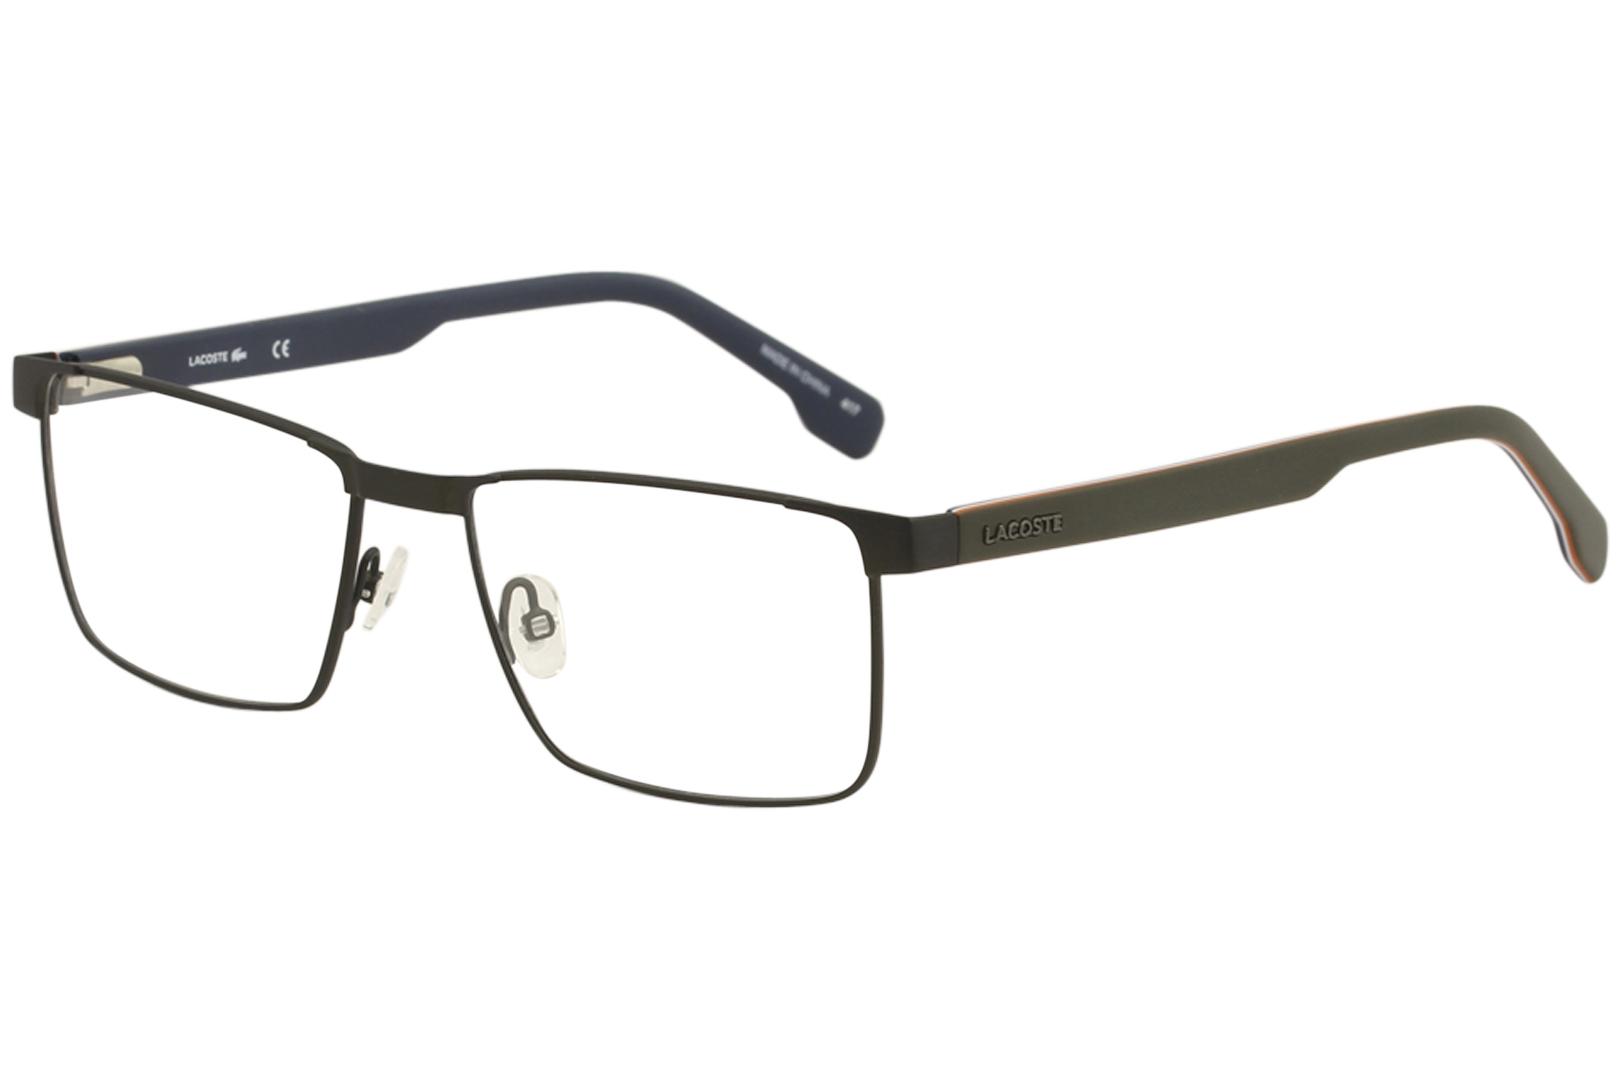 393f4172158c Lacoste Men s Eyeglasses L2243 L 2243 318 Matte Army Green Optical ...